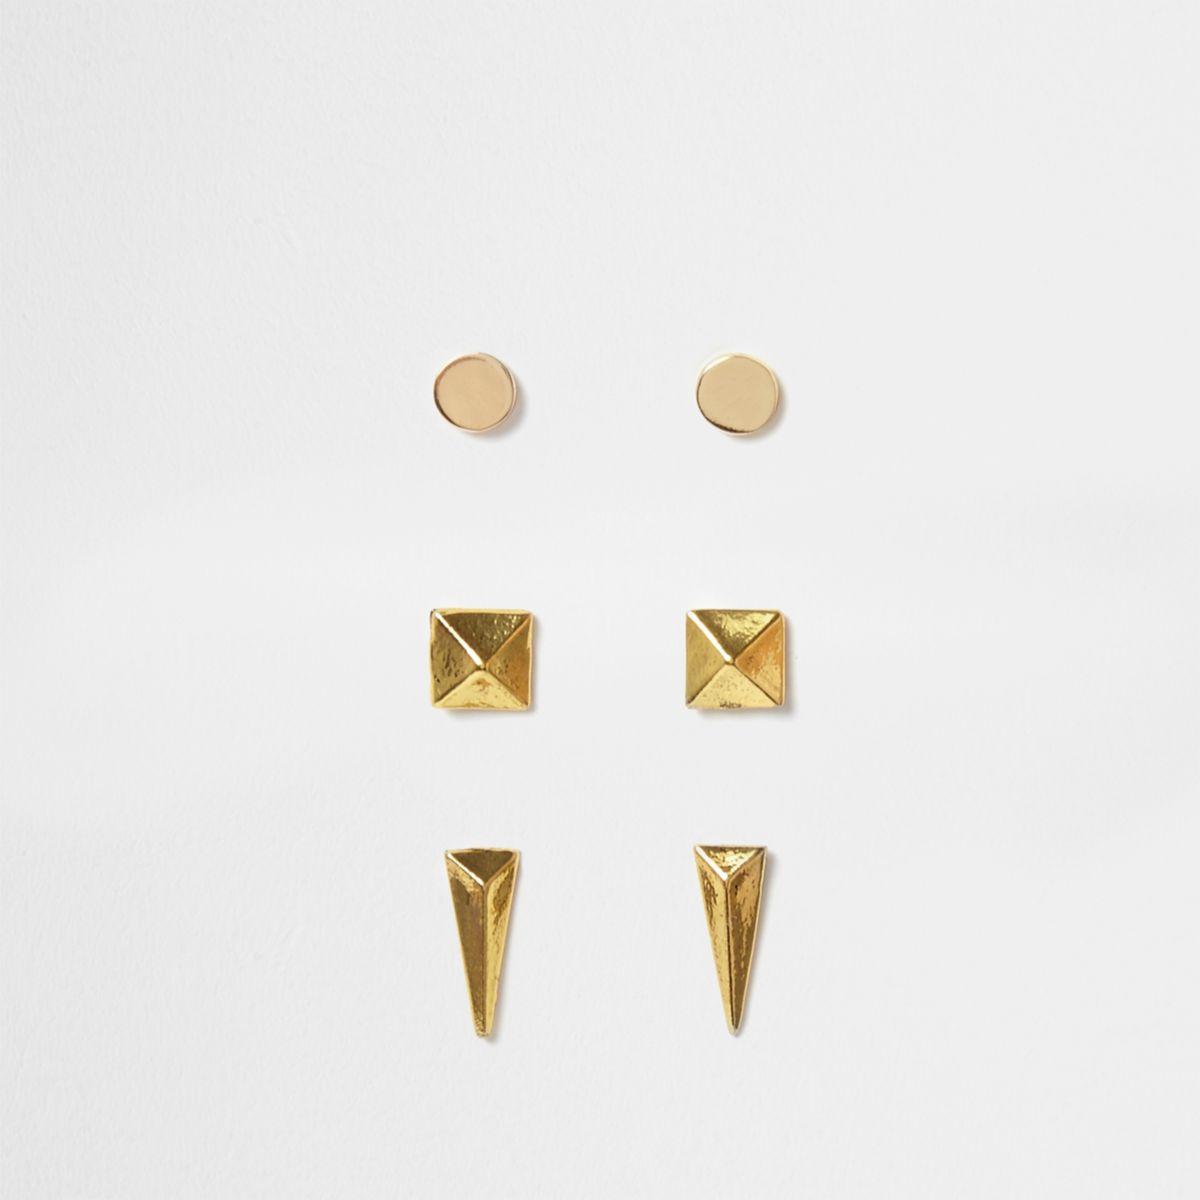 Gold tone stud earrings multipack